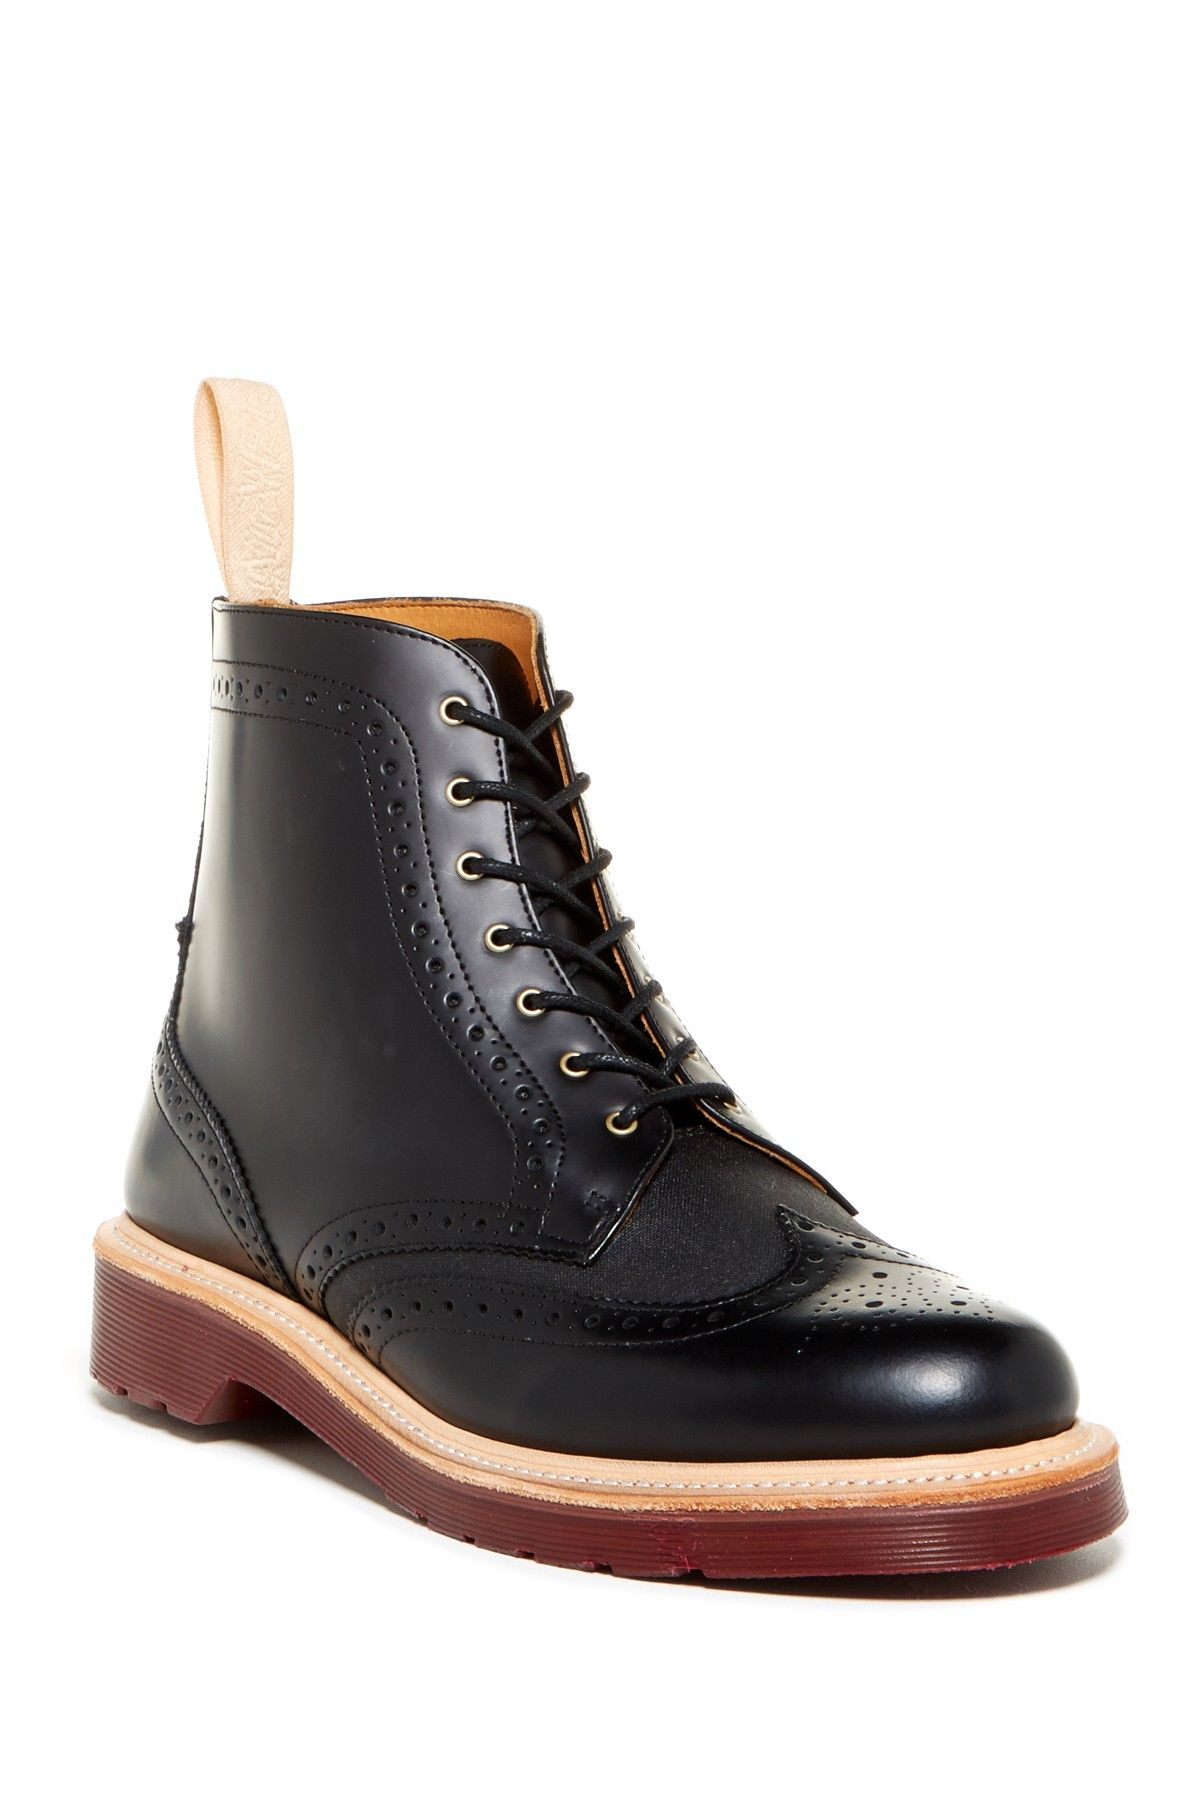 Dr. Martens   Boots men, Brogue boots, Mens fashion shoes